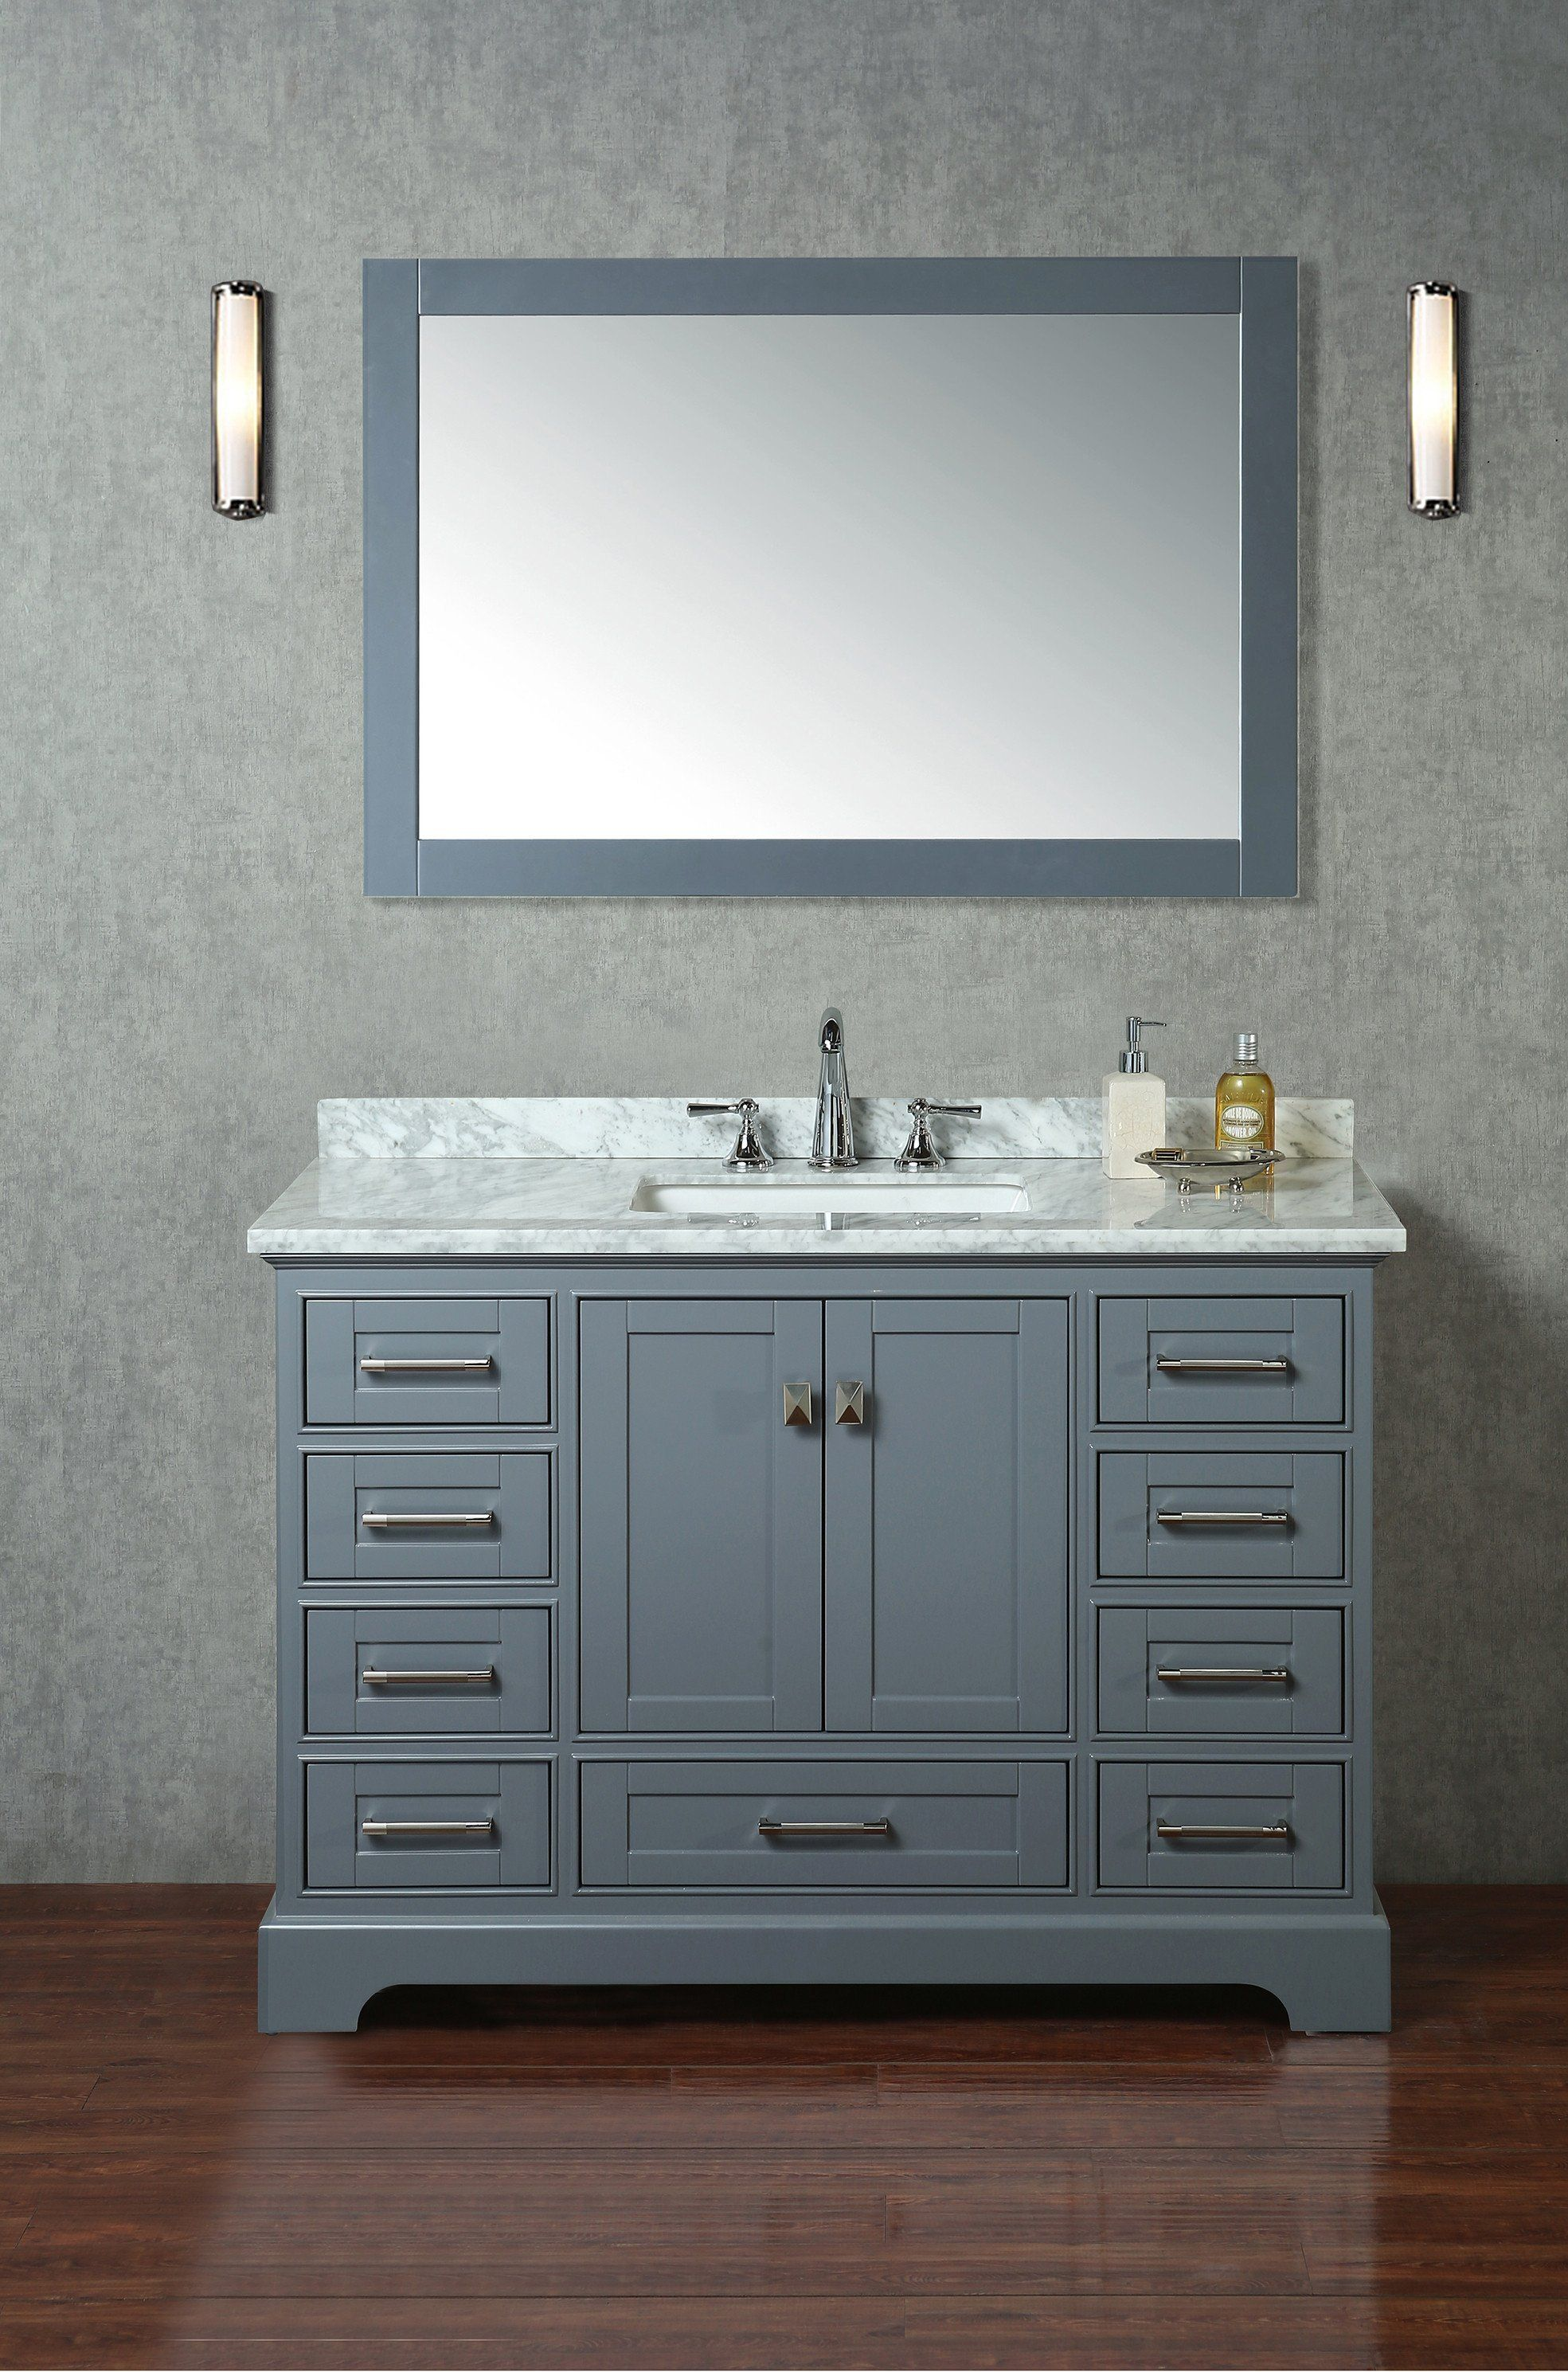 Stufurhome Newport Grey 48 Inch Single Sink Bathroom Vanity With Mirror In 2021 Single Sink Bathroom Vanity Bathroom Vanity Marble Vanity Tops